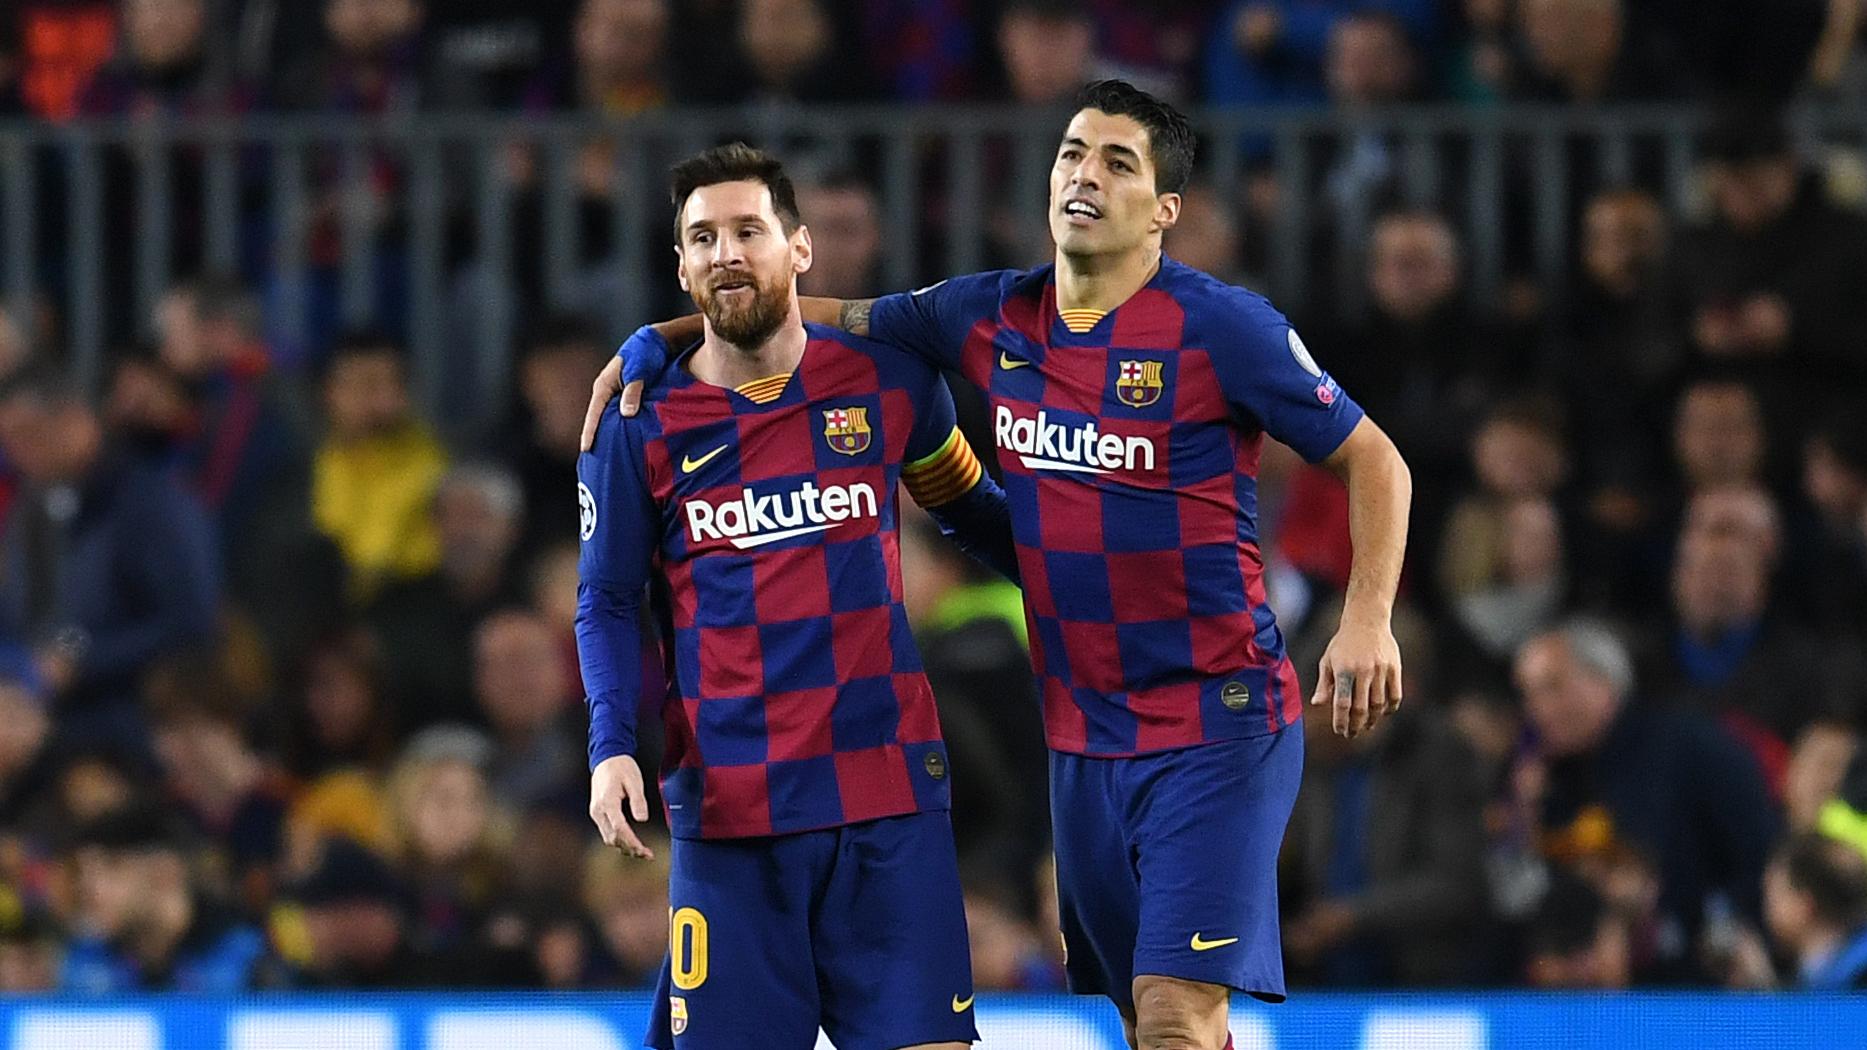 Messi was misunderstood over retirement plans  – Suarez